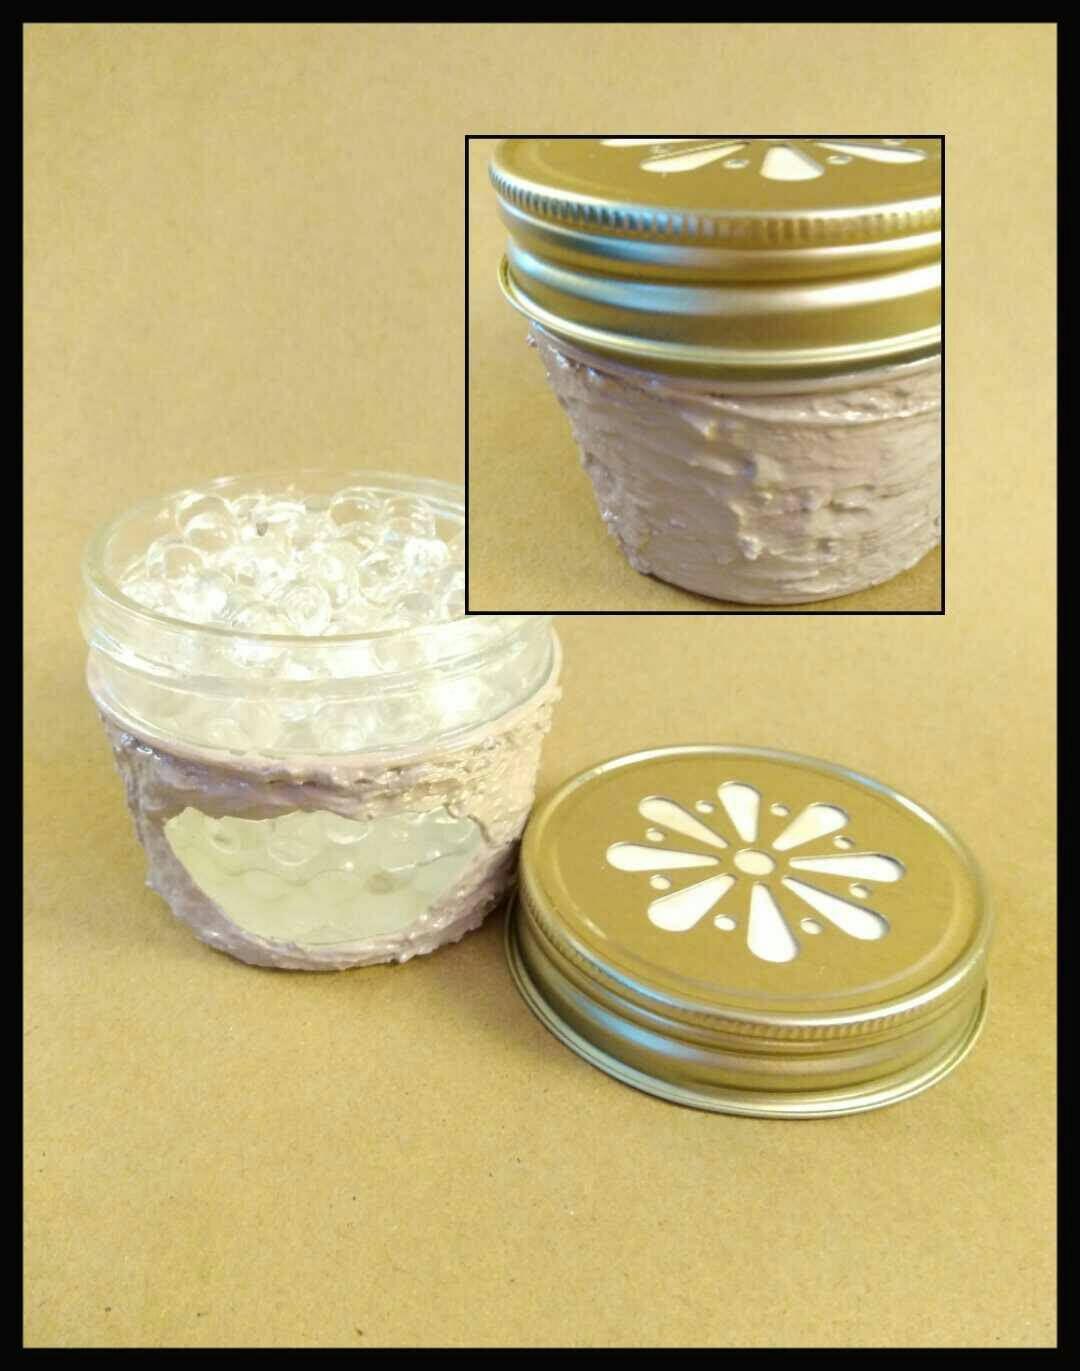 Lavender Rose Air Freshener Scented Gel Beads Bathroom Air Alluring Bathroom Air Freshener Design Decoration